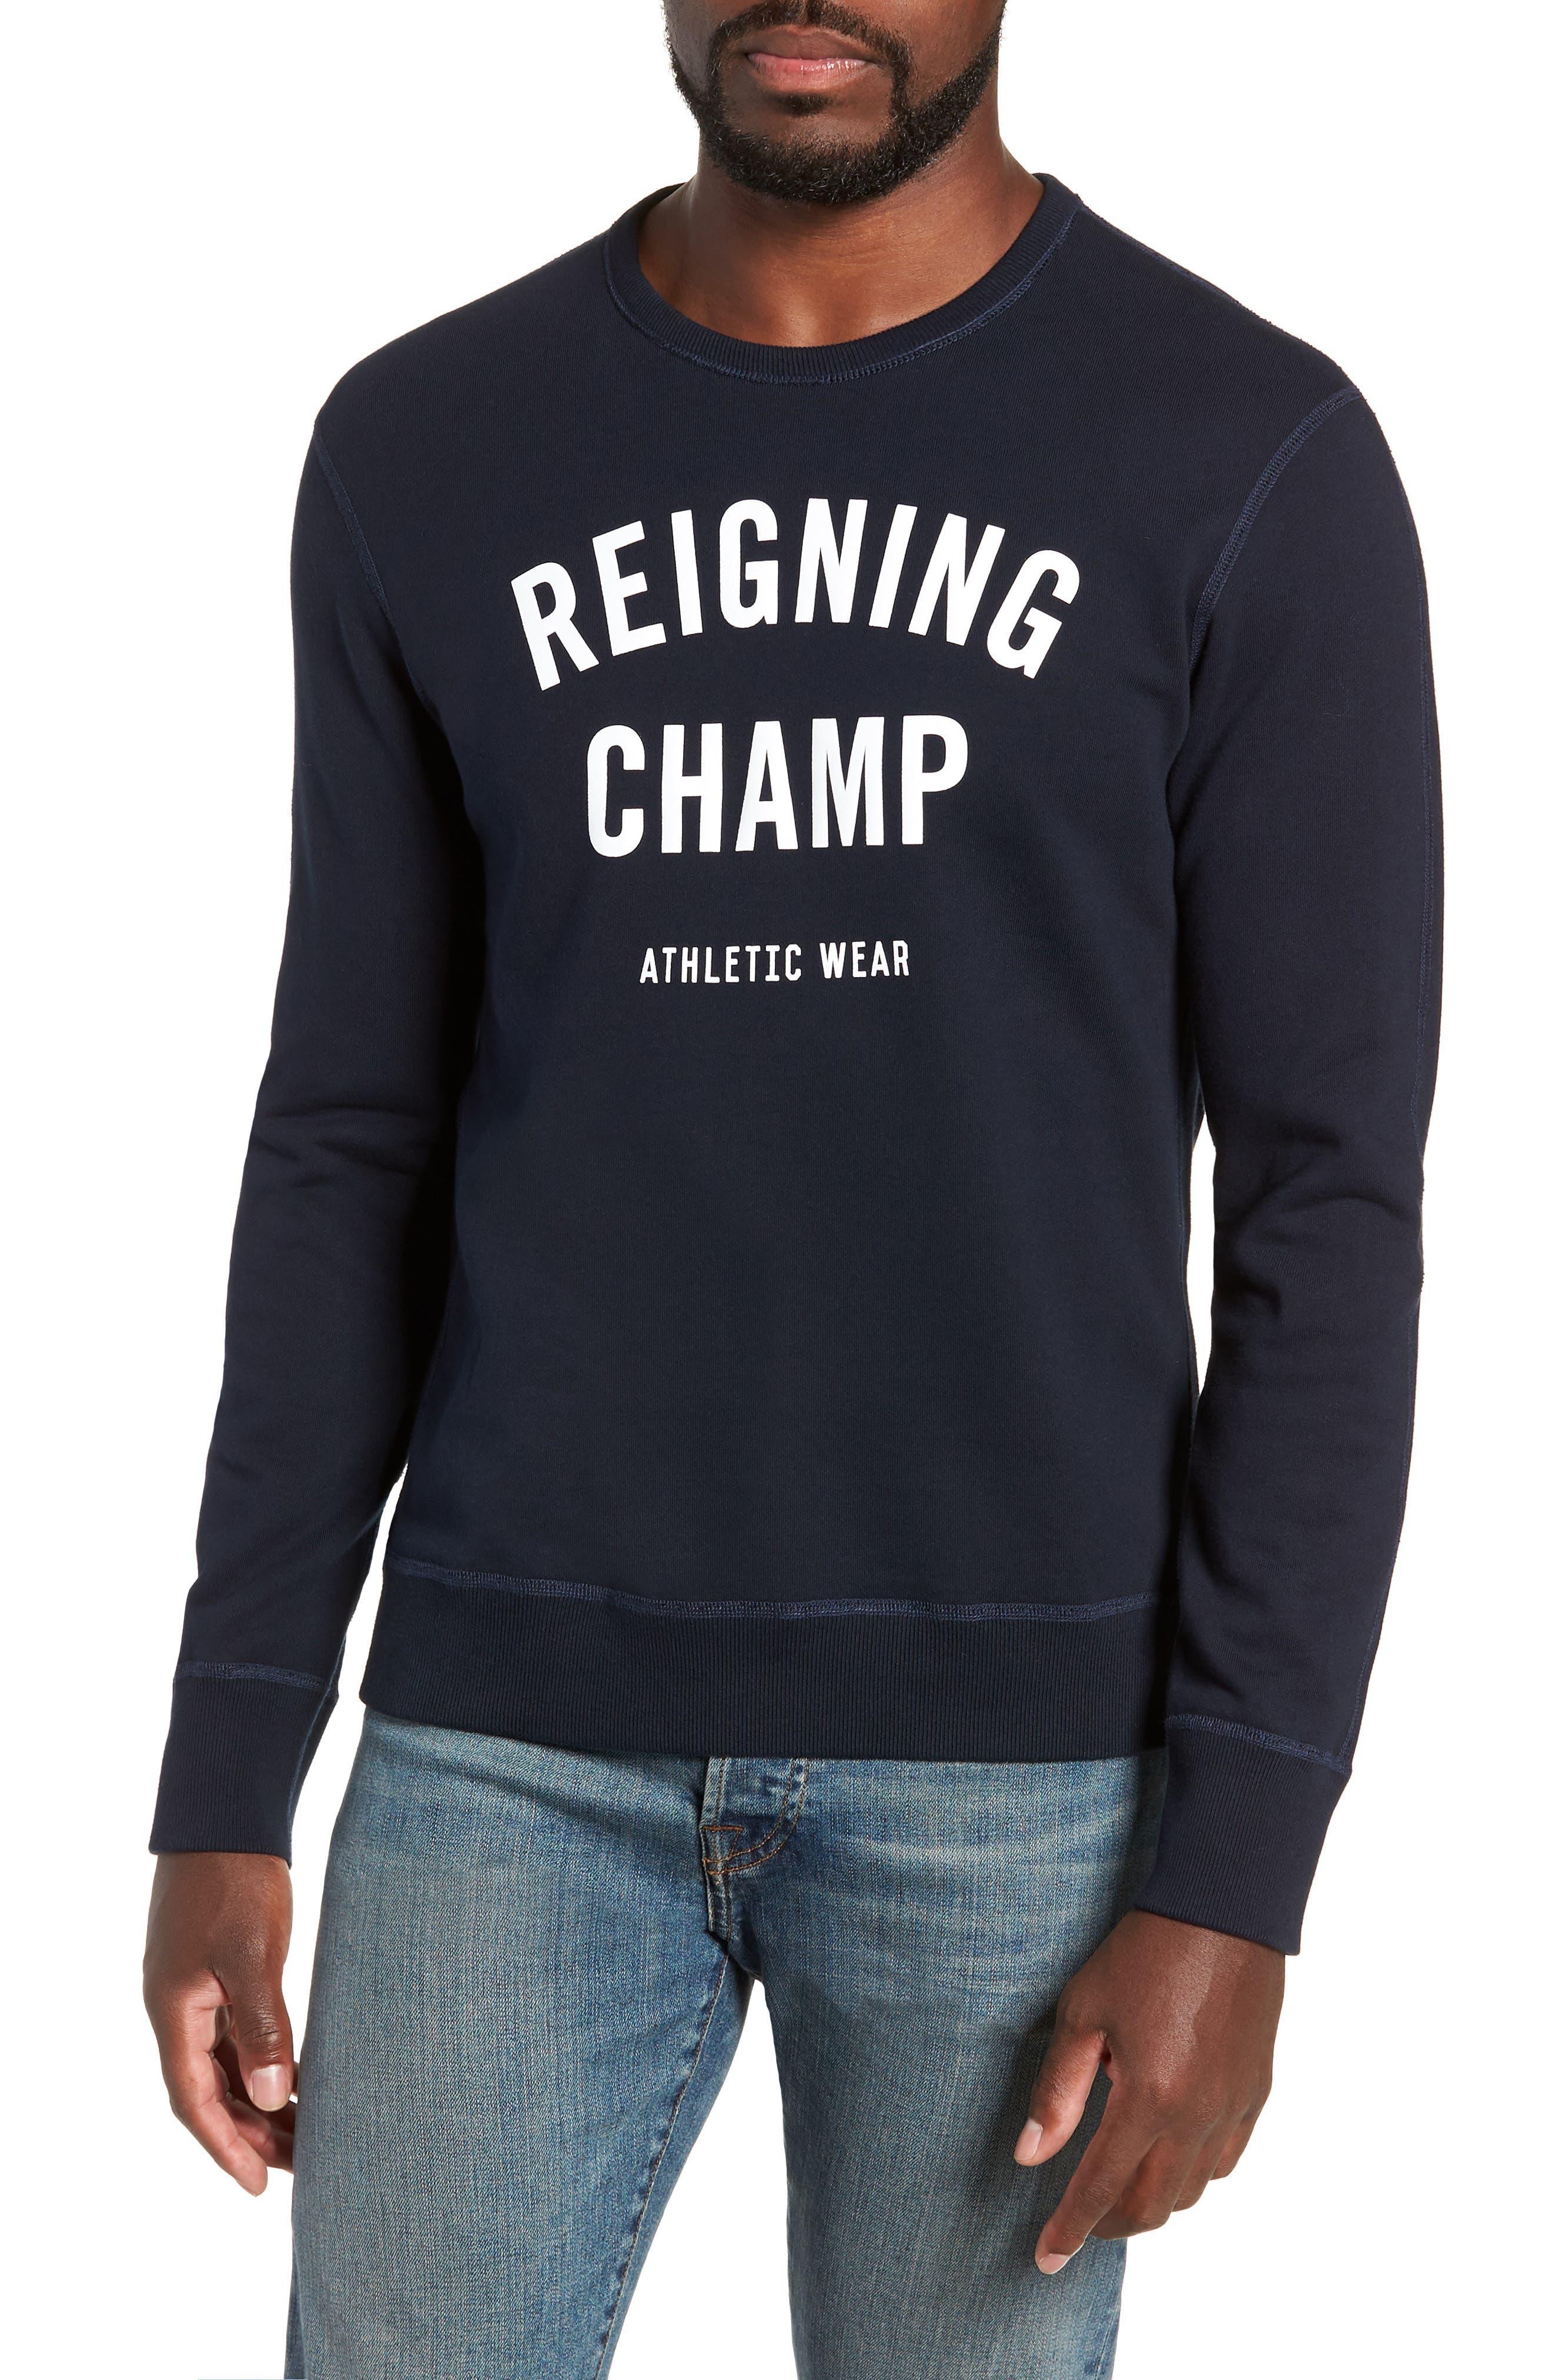 REIGNING CHAMP Gym Logo Sweatshirt in Navy/ White